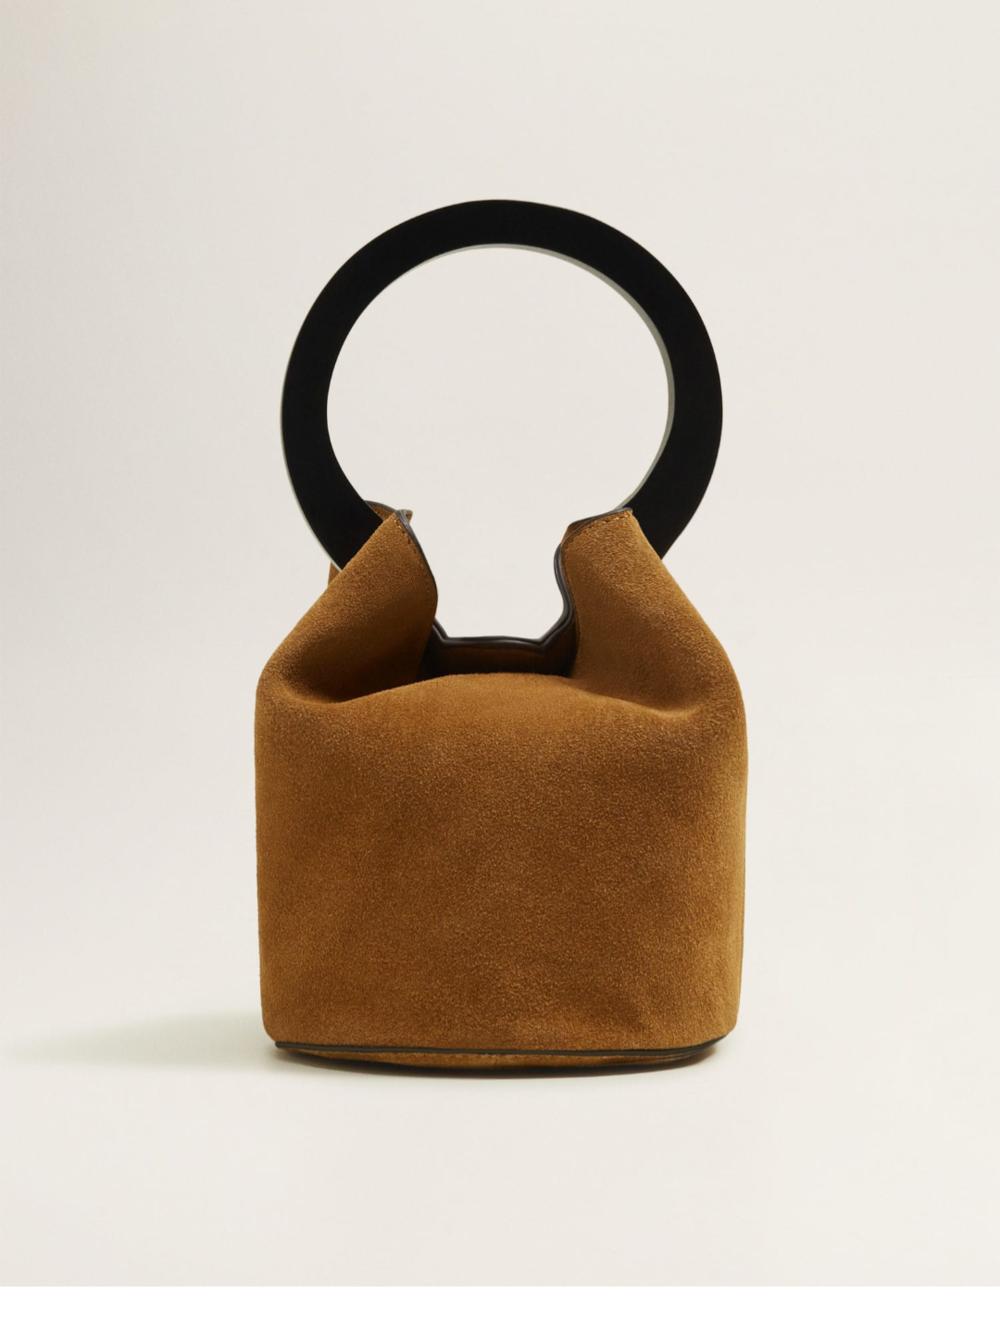 https://shop.mango.com/ca/women/bags-handbags/wooden-handle-leather-bag_33030728.html?c=37&n=1&s=accesorios.accesorio;40,340,440